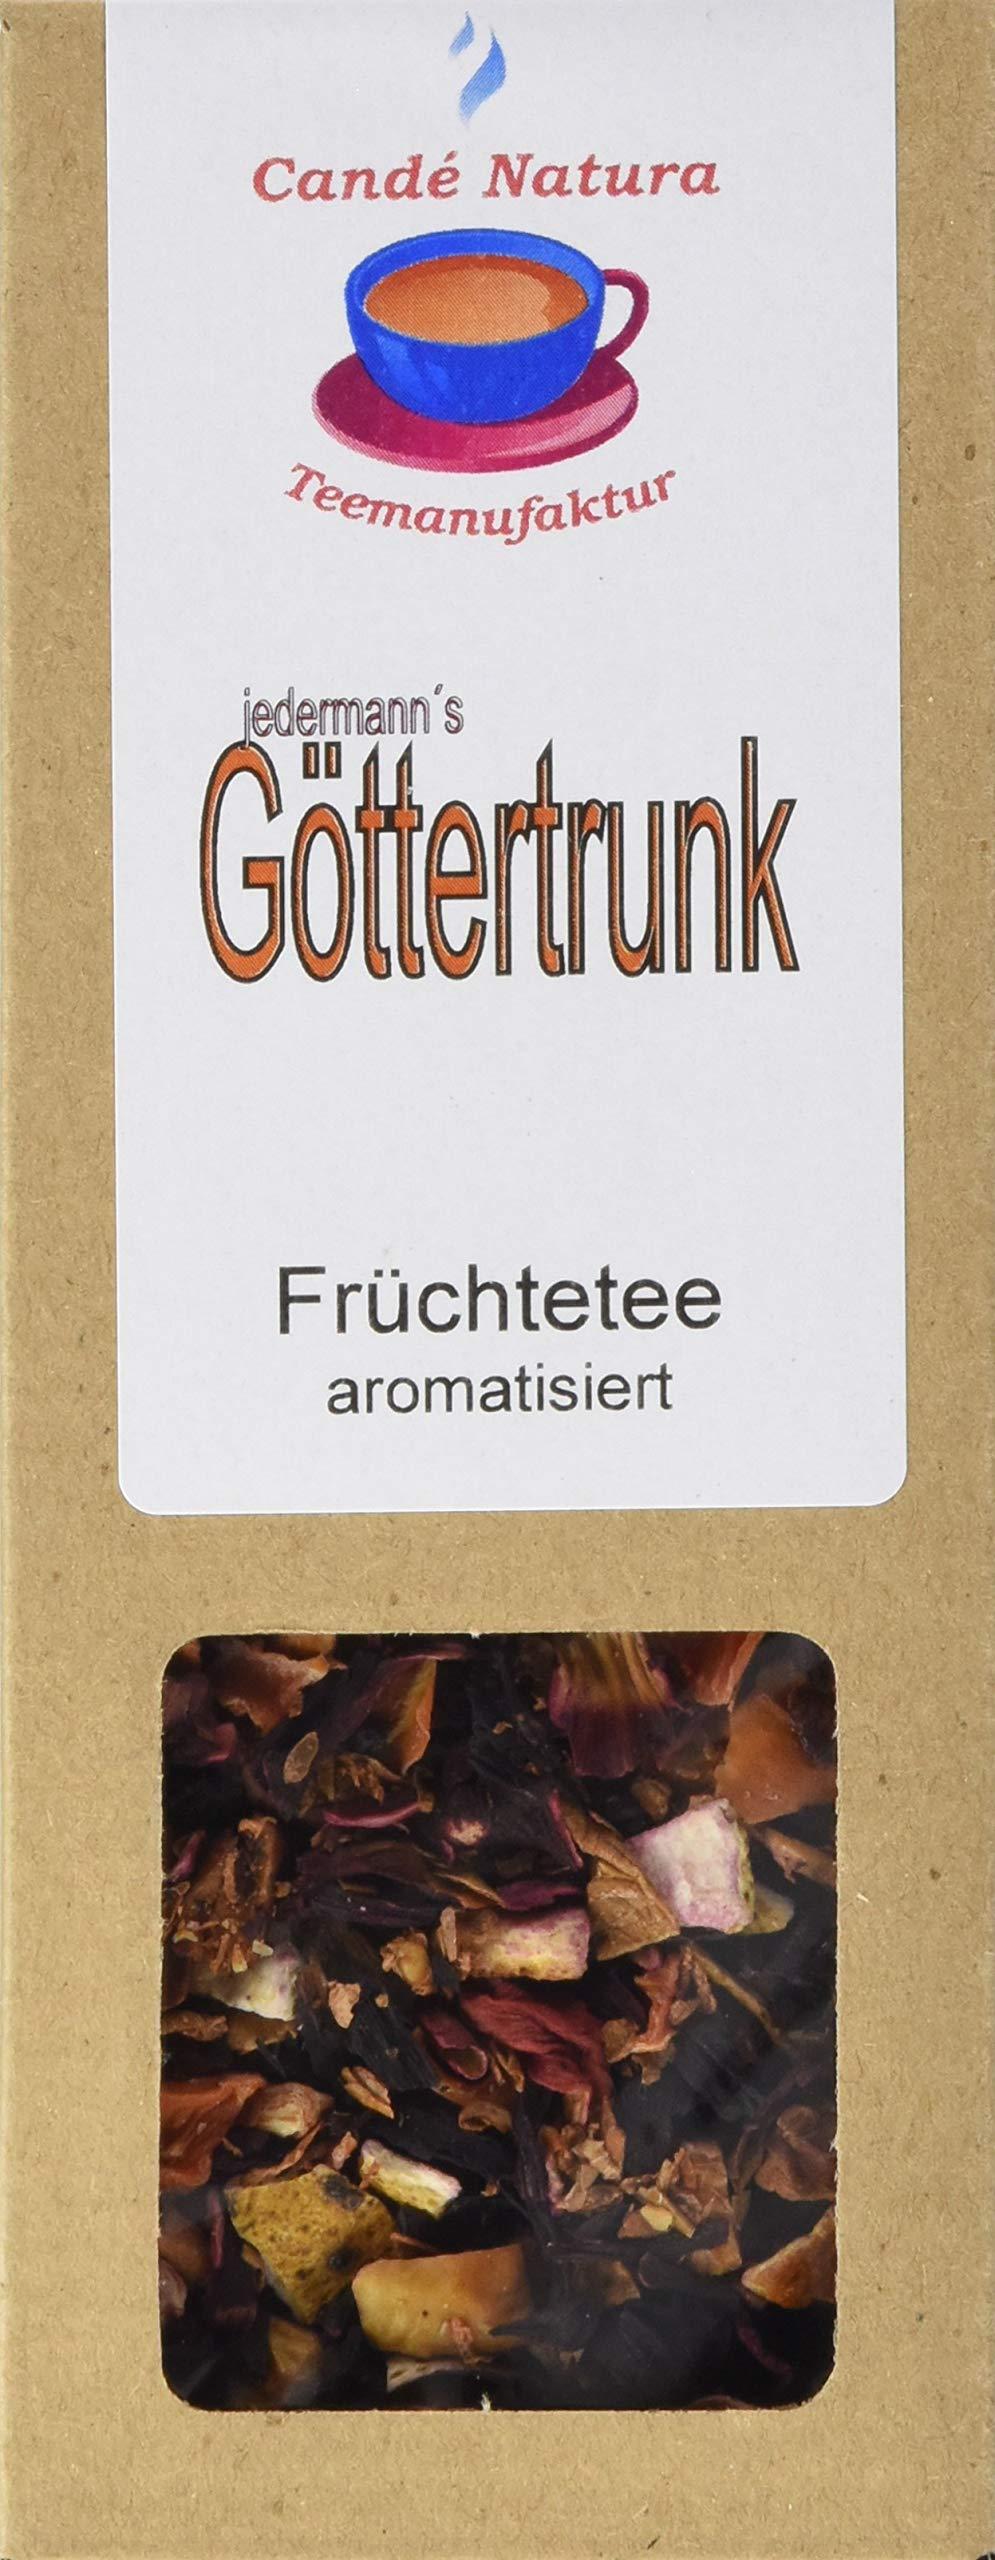 Cand-Natura-Teemanufaktur-Gttertrunk-Frchteteemischung-aromatisiert-5er-Pack-5-x-100g